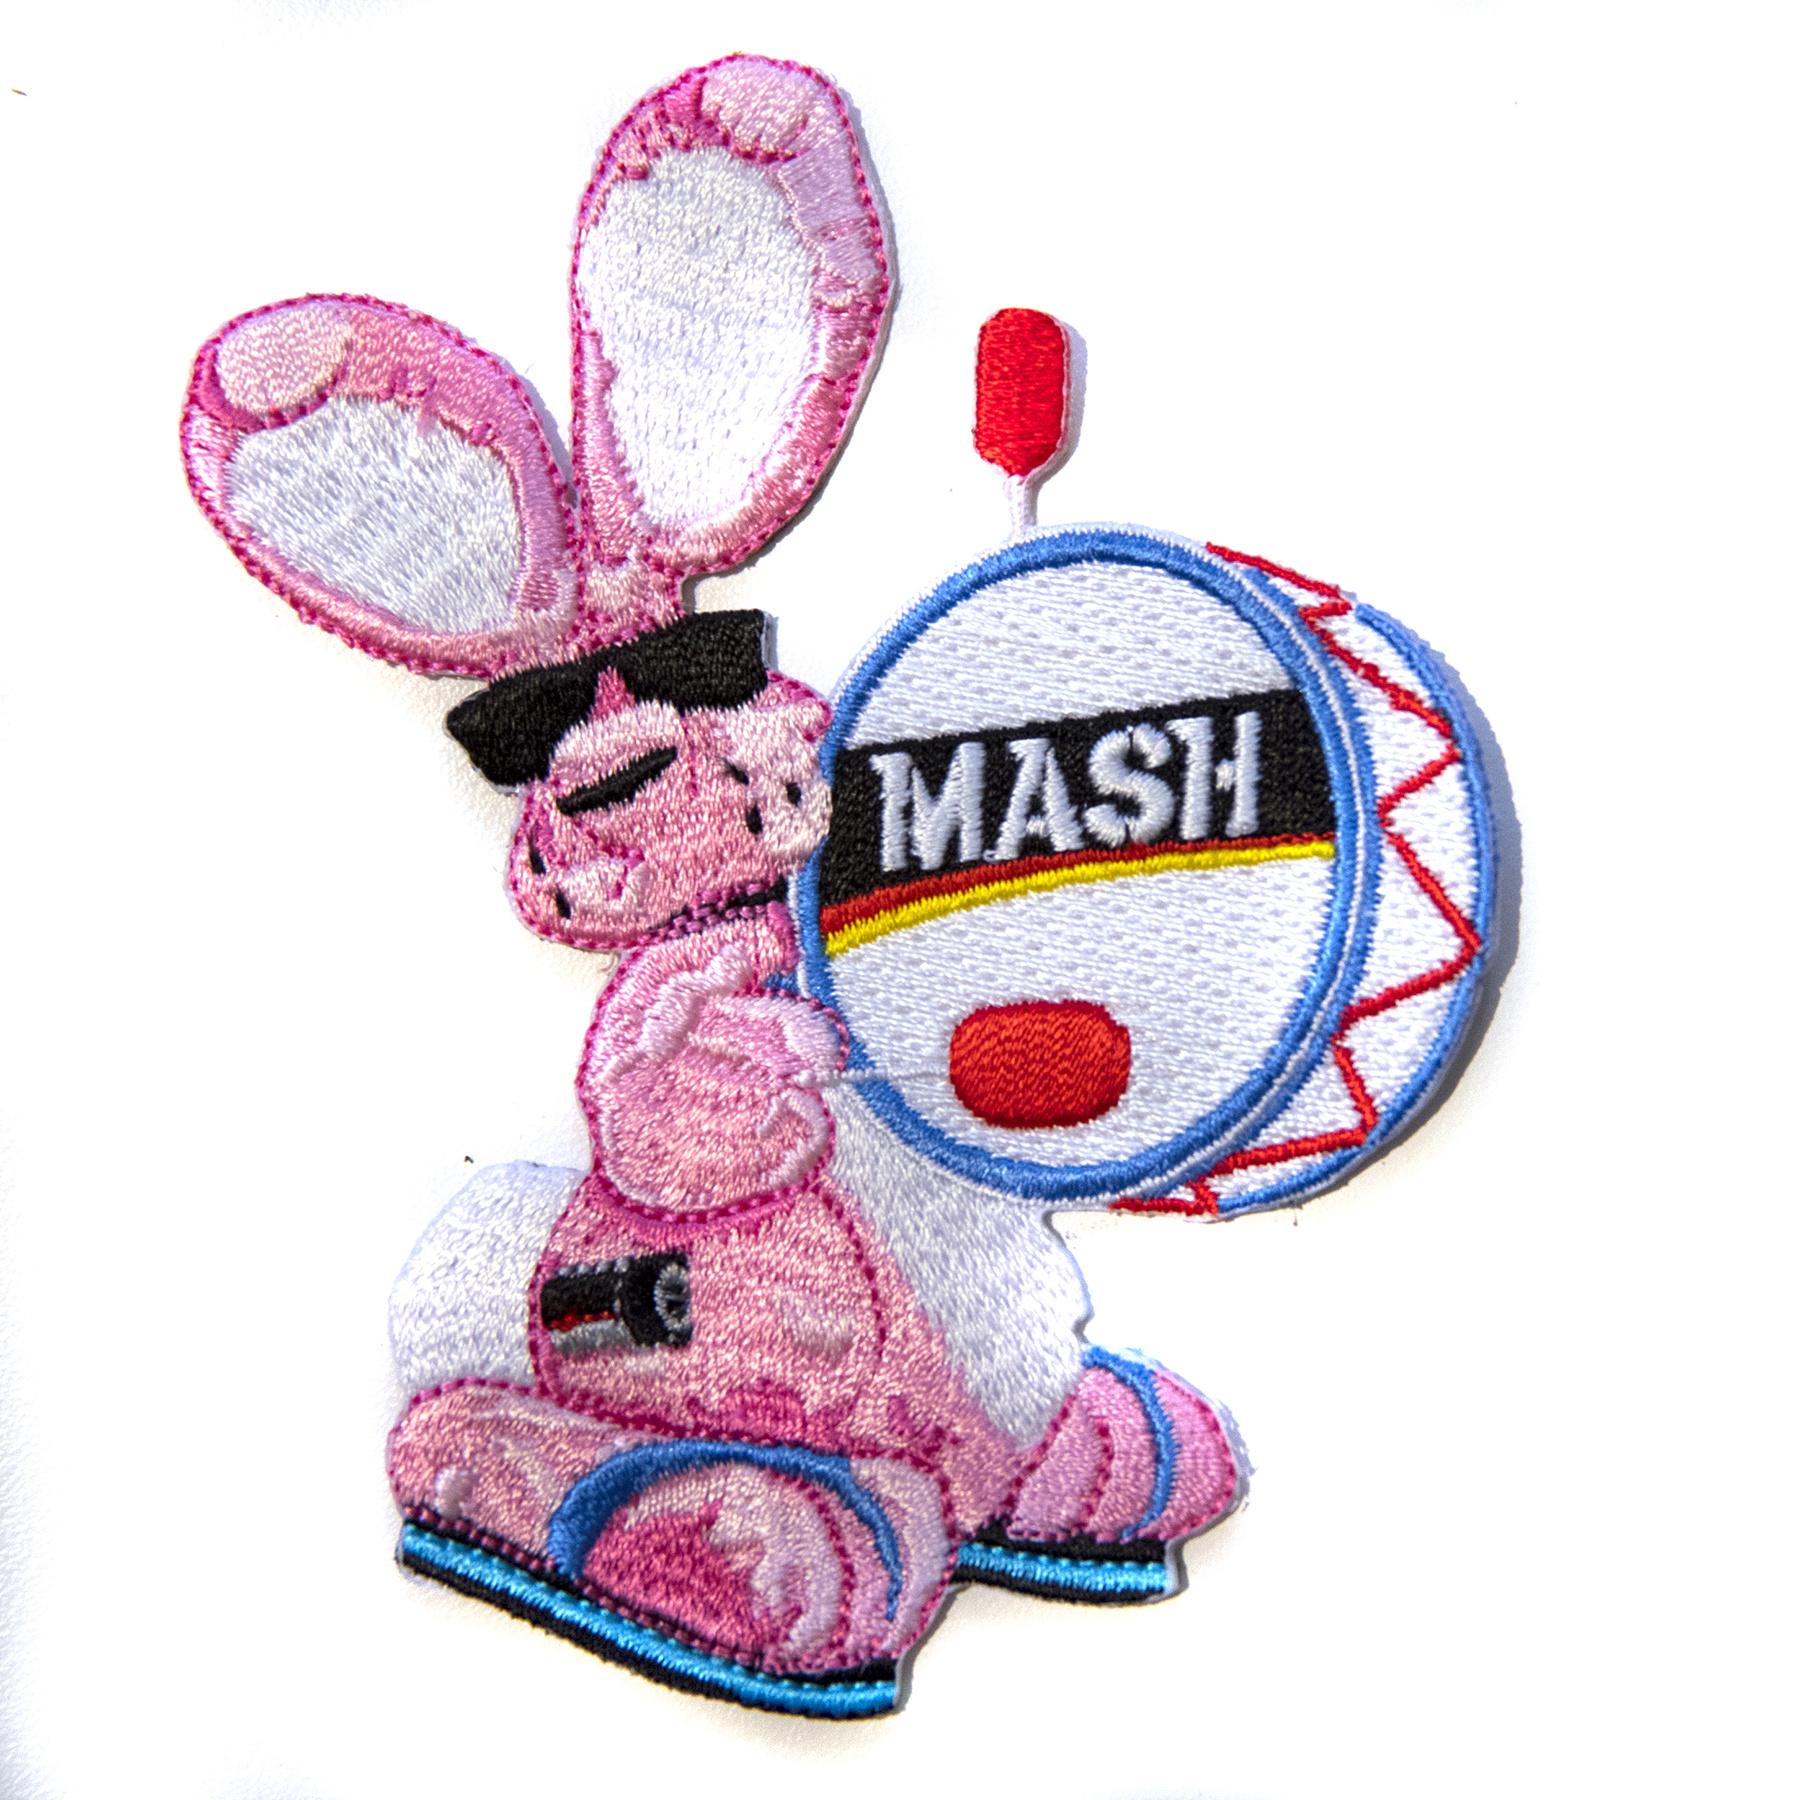 MASH Energize Patch